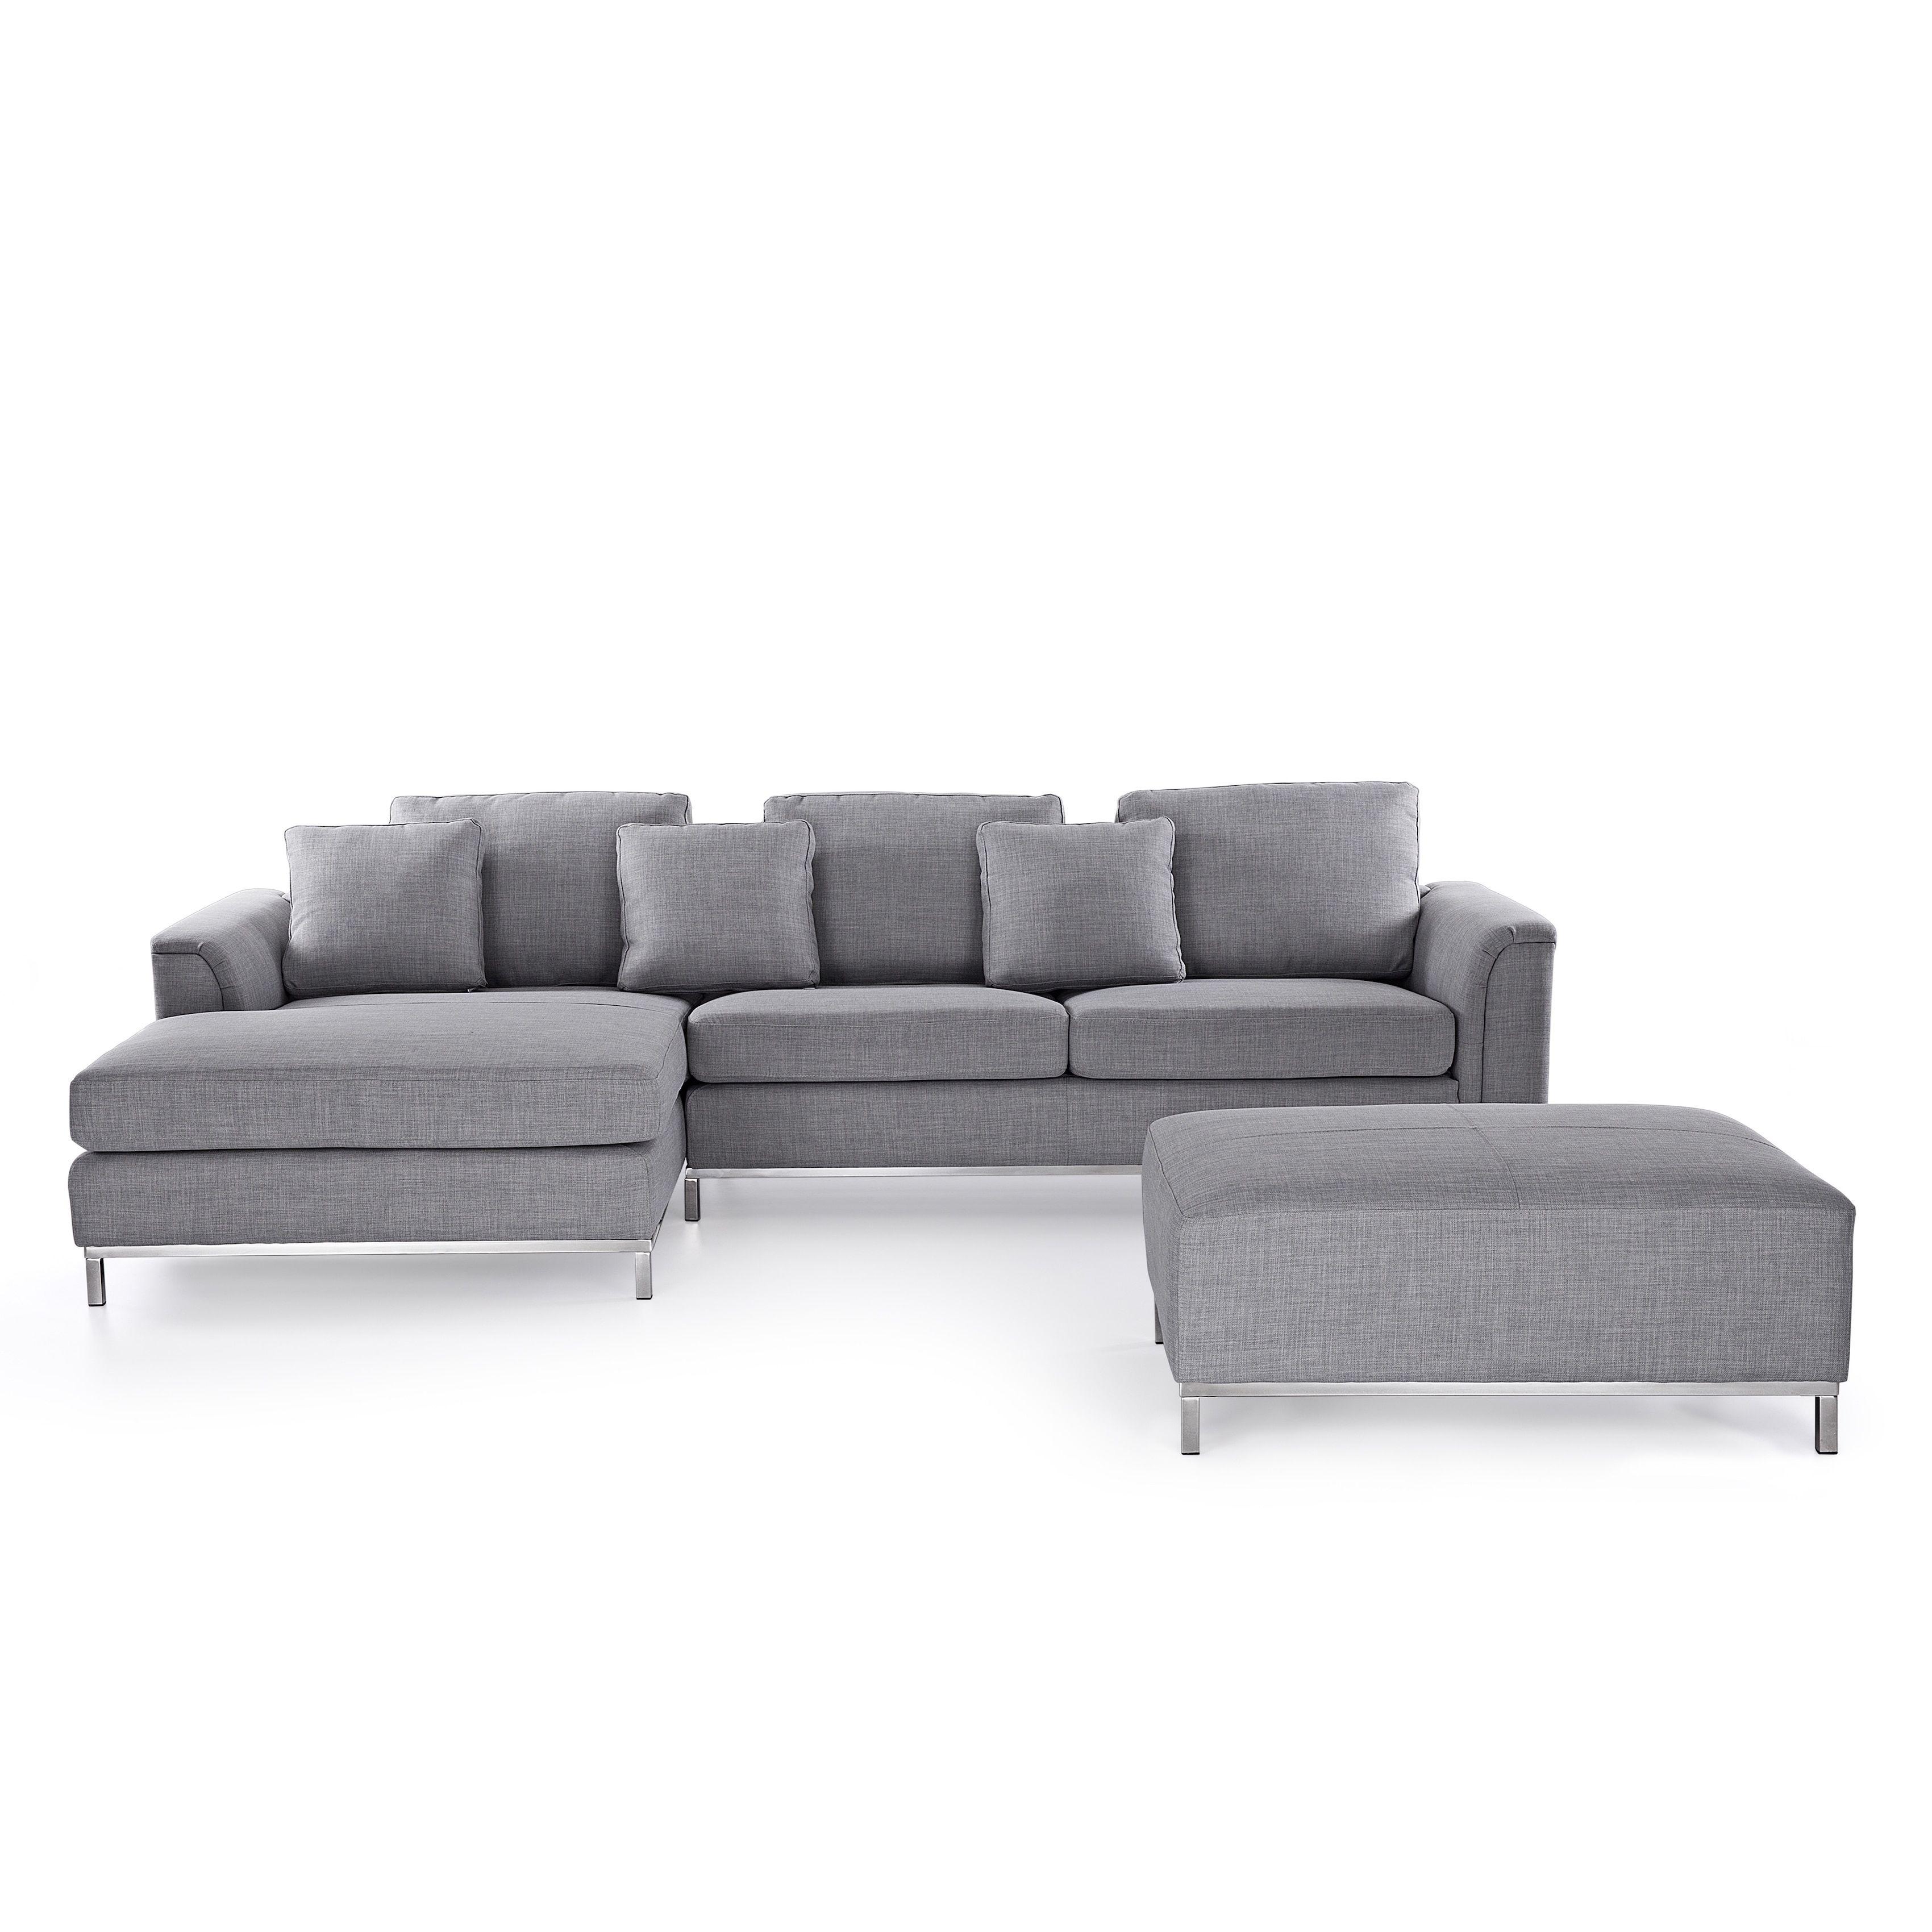 Beliani Oslo Modern Sectional Sofa with Ottoman